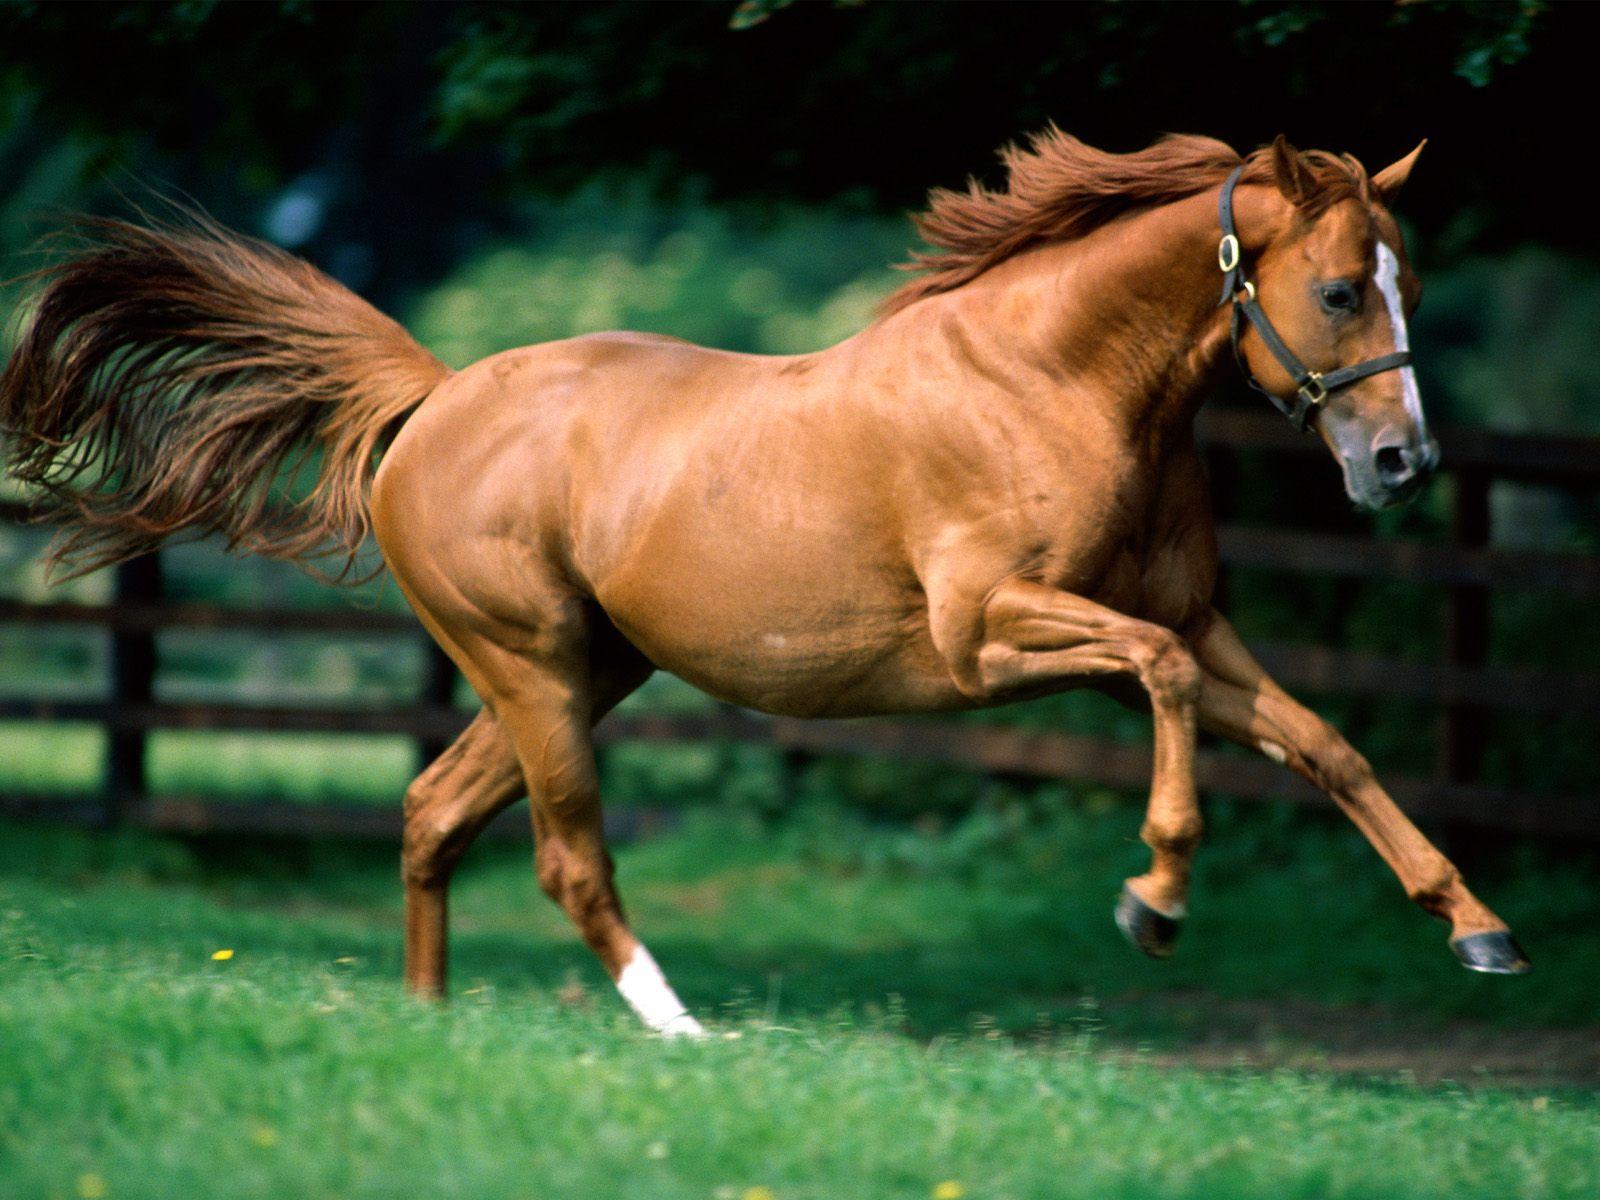 Running Horses Wallpapers Brown Horse Running Wallpapers for Desktop 1600x1200